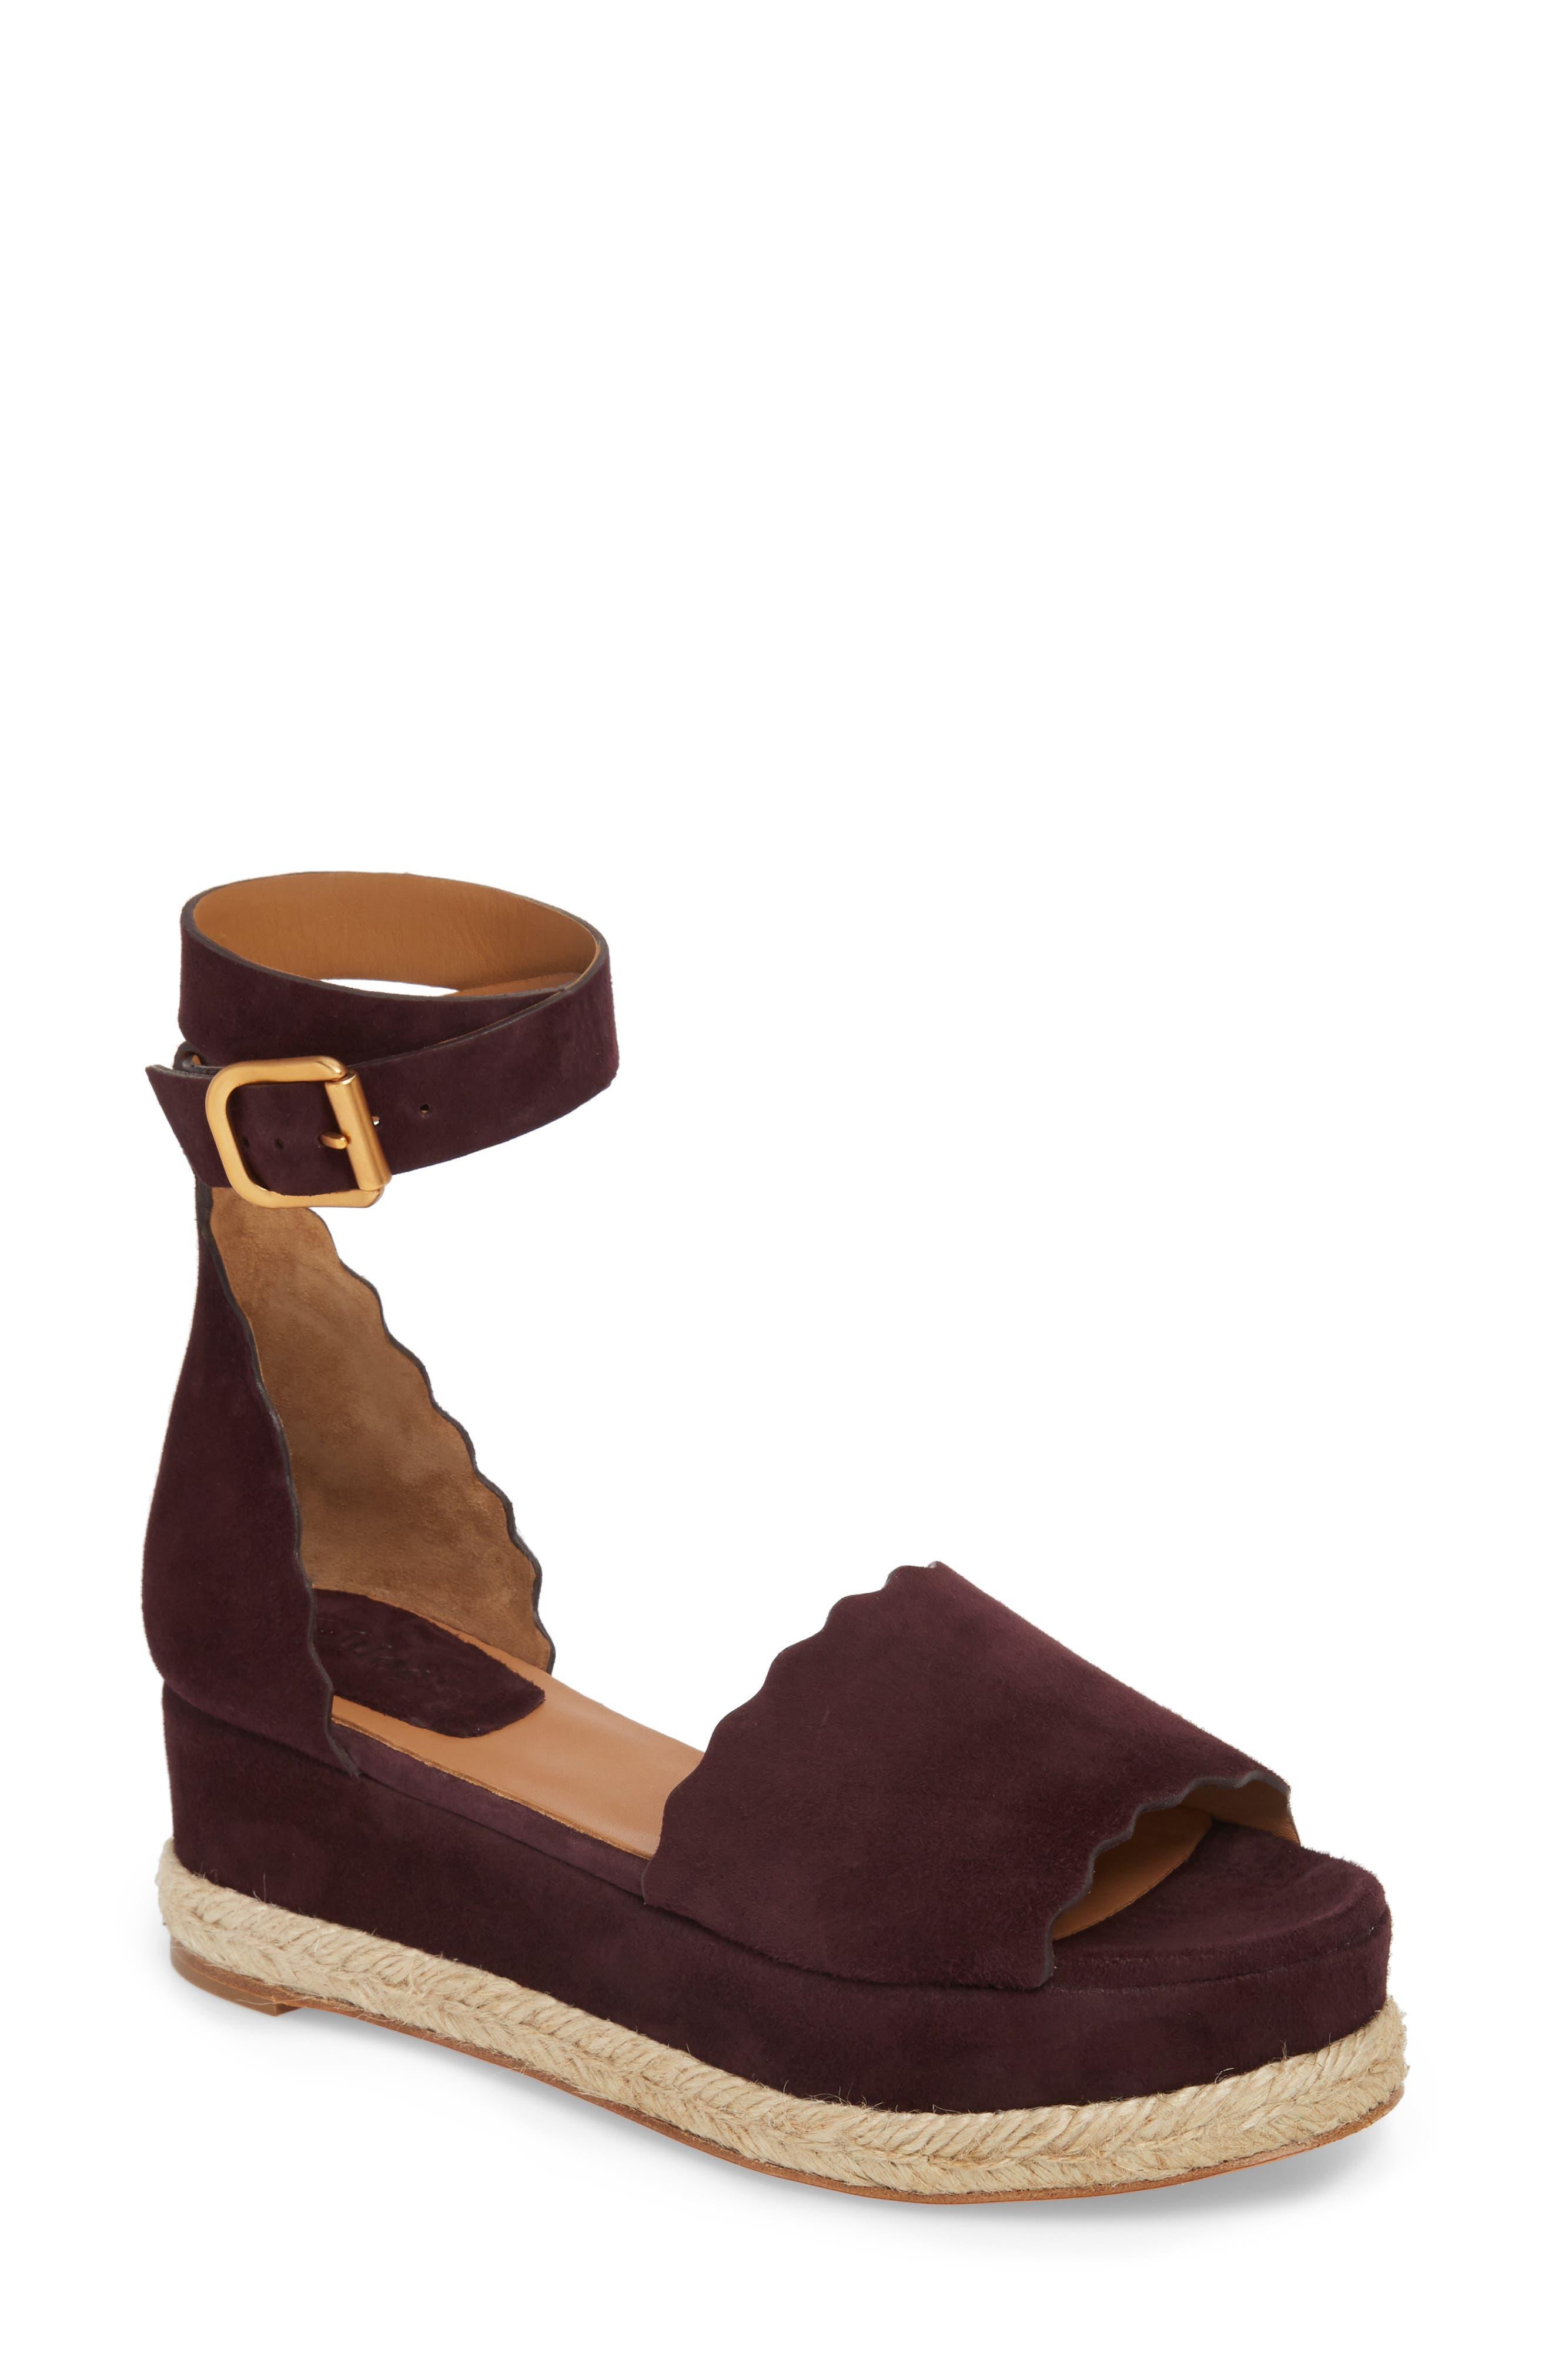 Lauren Espadrille Wedge Sandal,                         Main,                         color, Dark Purple